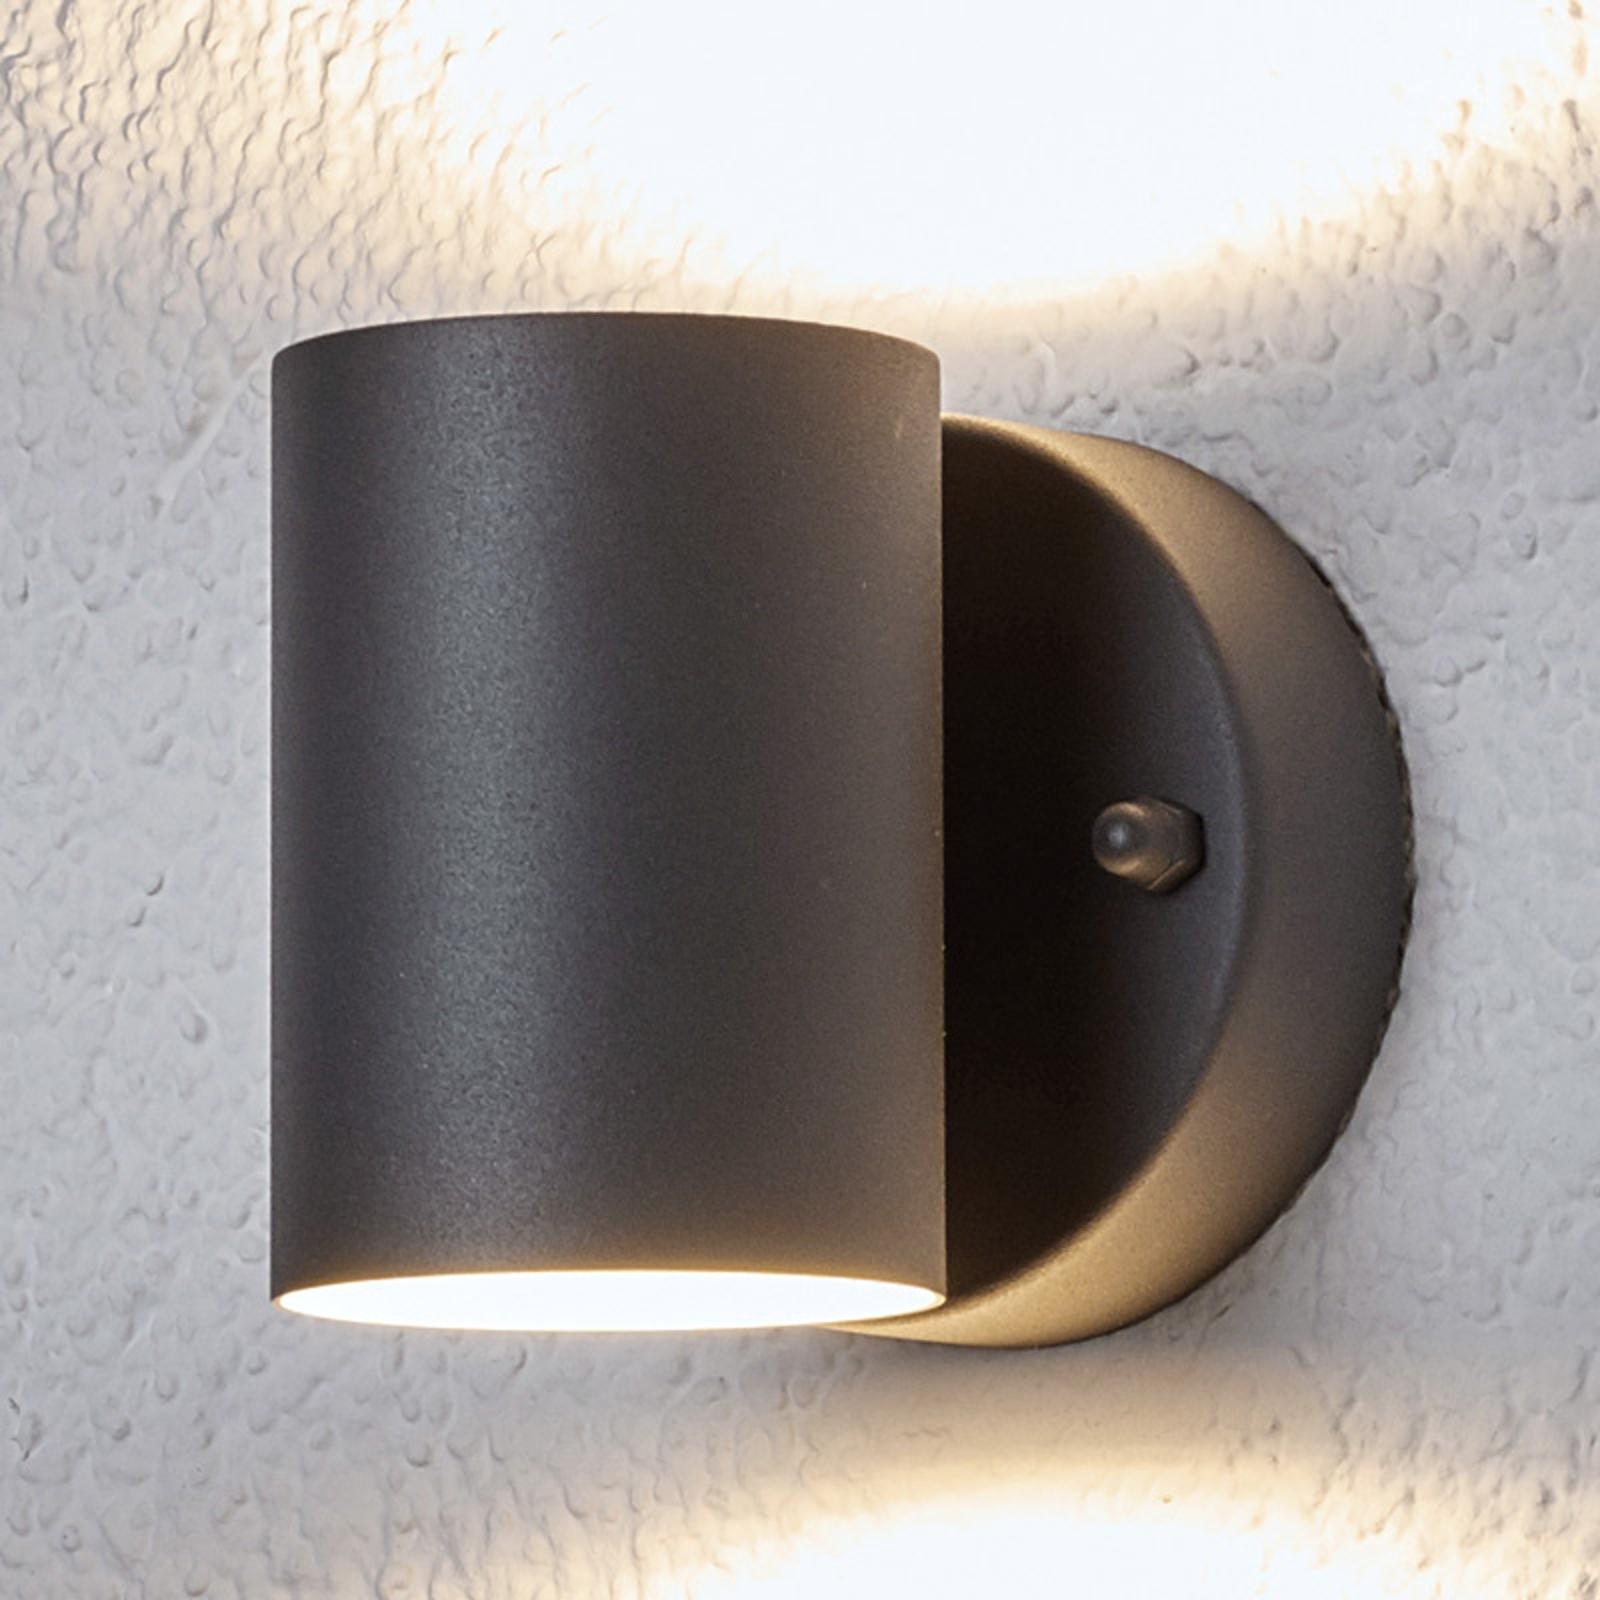 Lexi - LED-Außenwandleuchte, 2-flammig